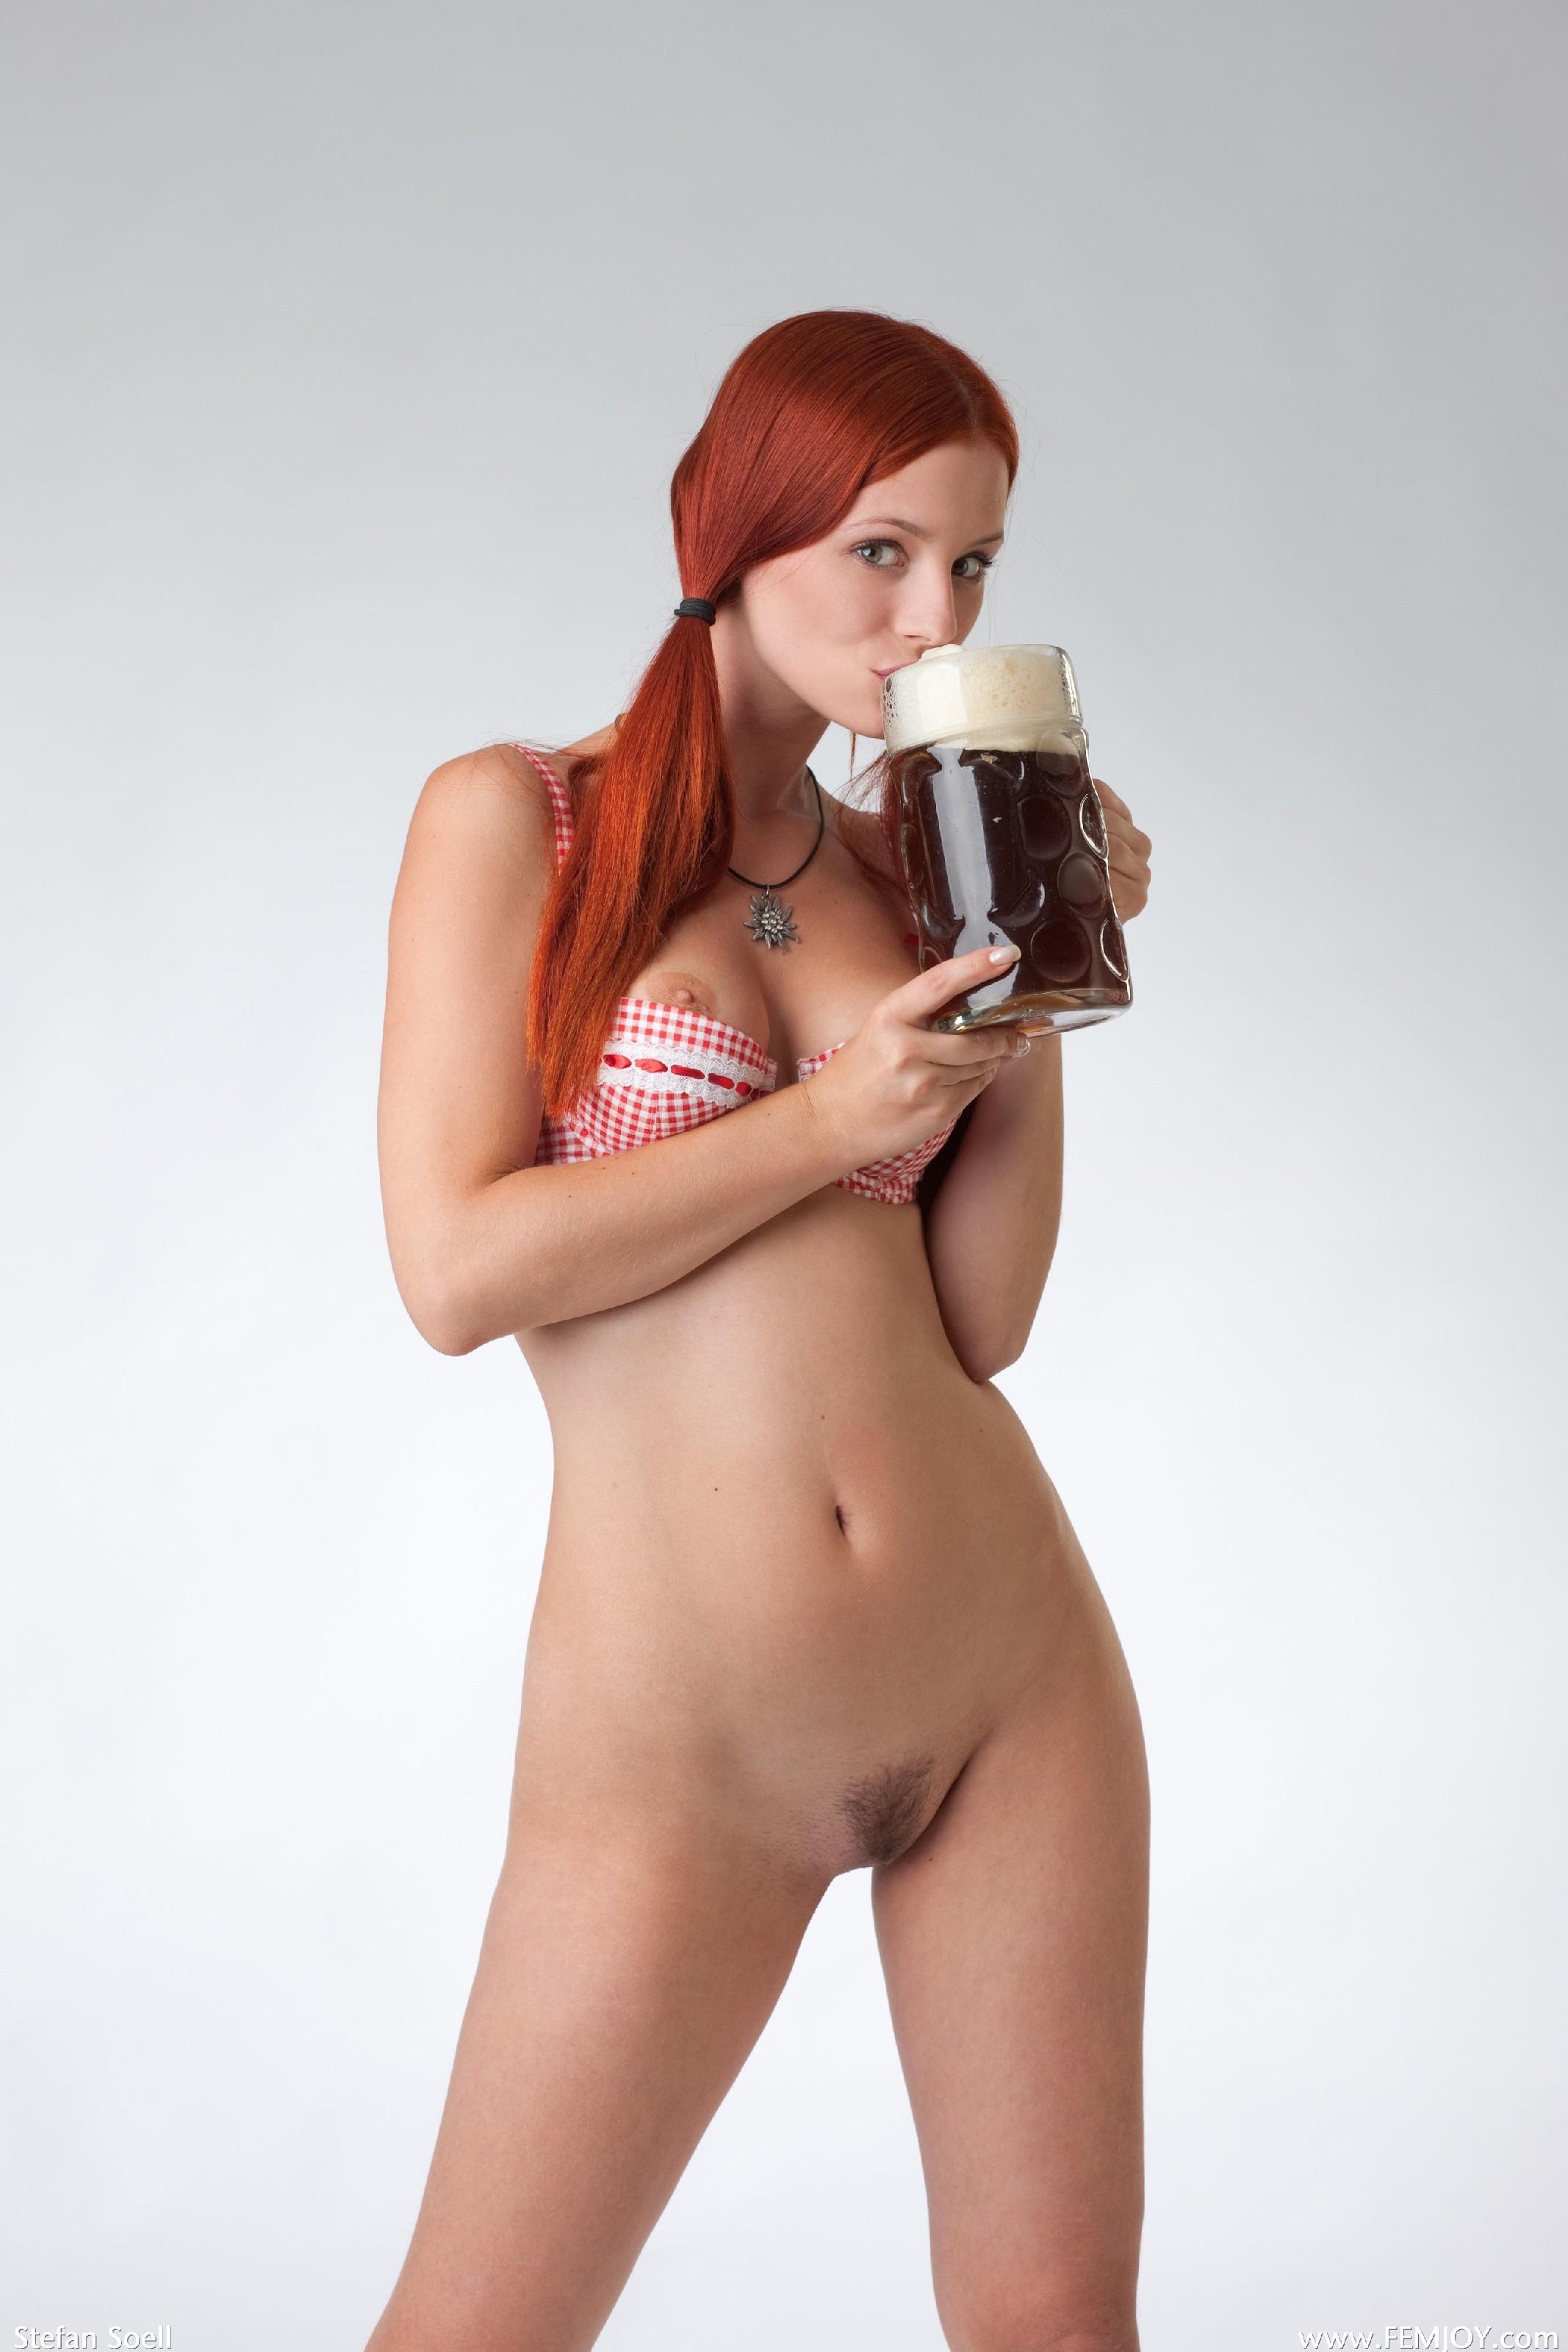 Girl girls beer nude shaped titties